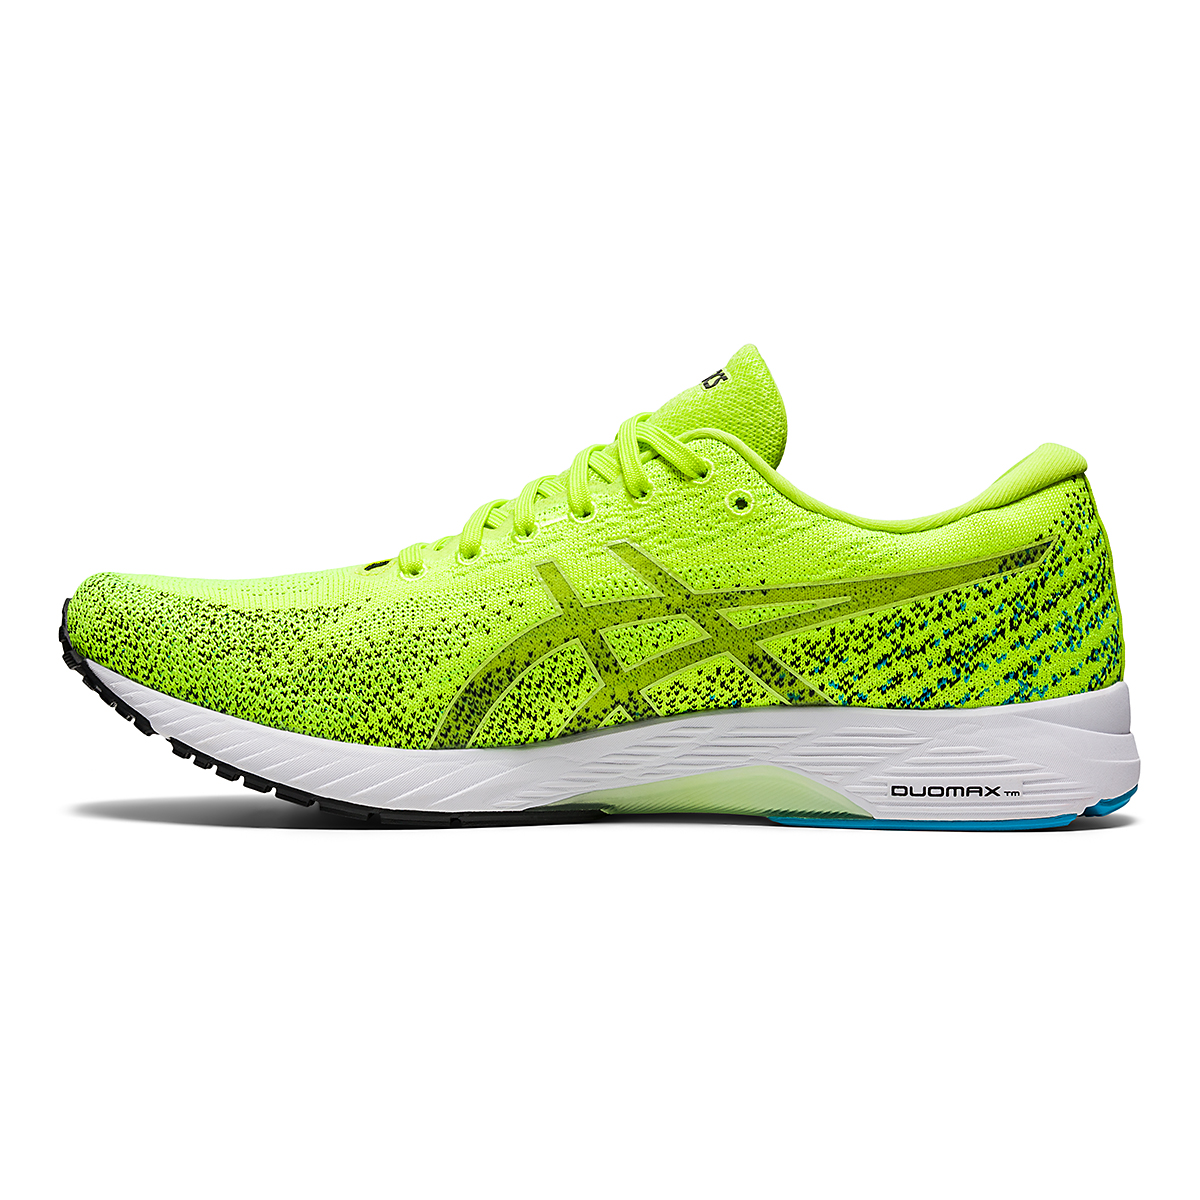 Men's Asics Gel-DS Trainer 26 Running Shoe - Color: Hazard Green/Black - Size: 6 - Width: Regular, Hazard Green/Black, large, image 2